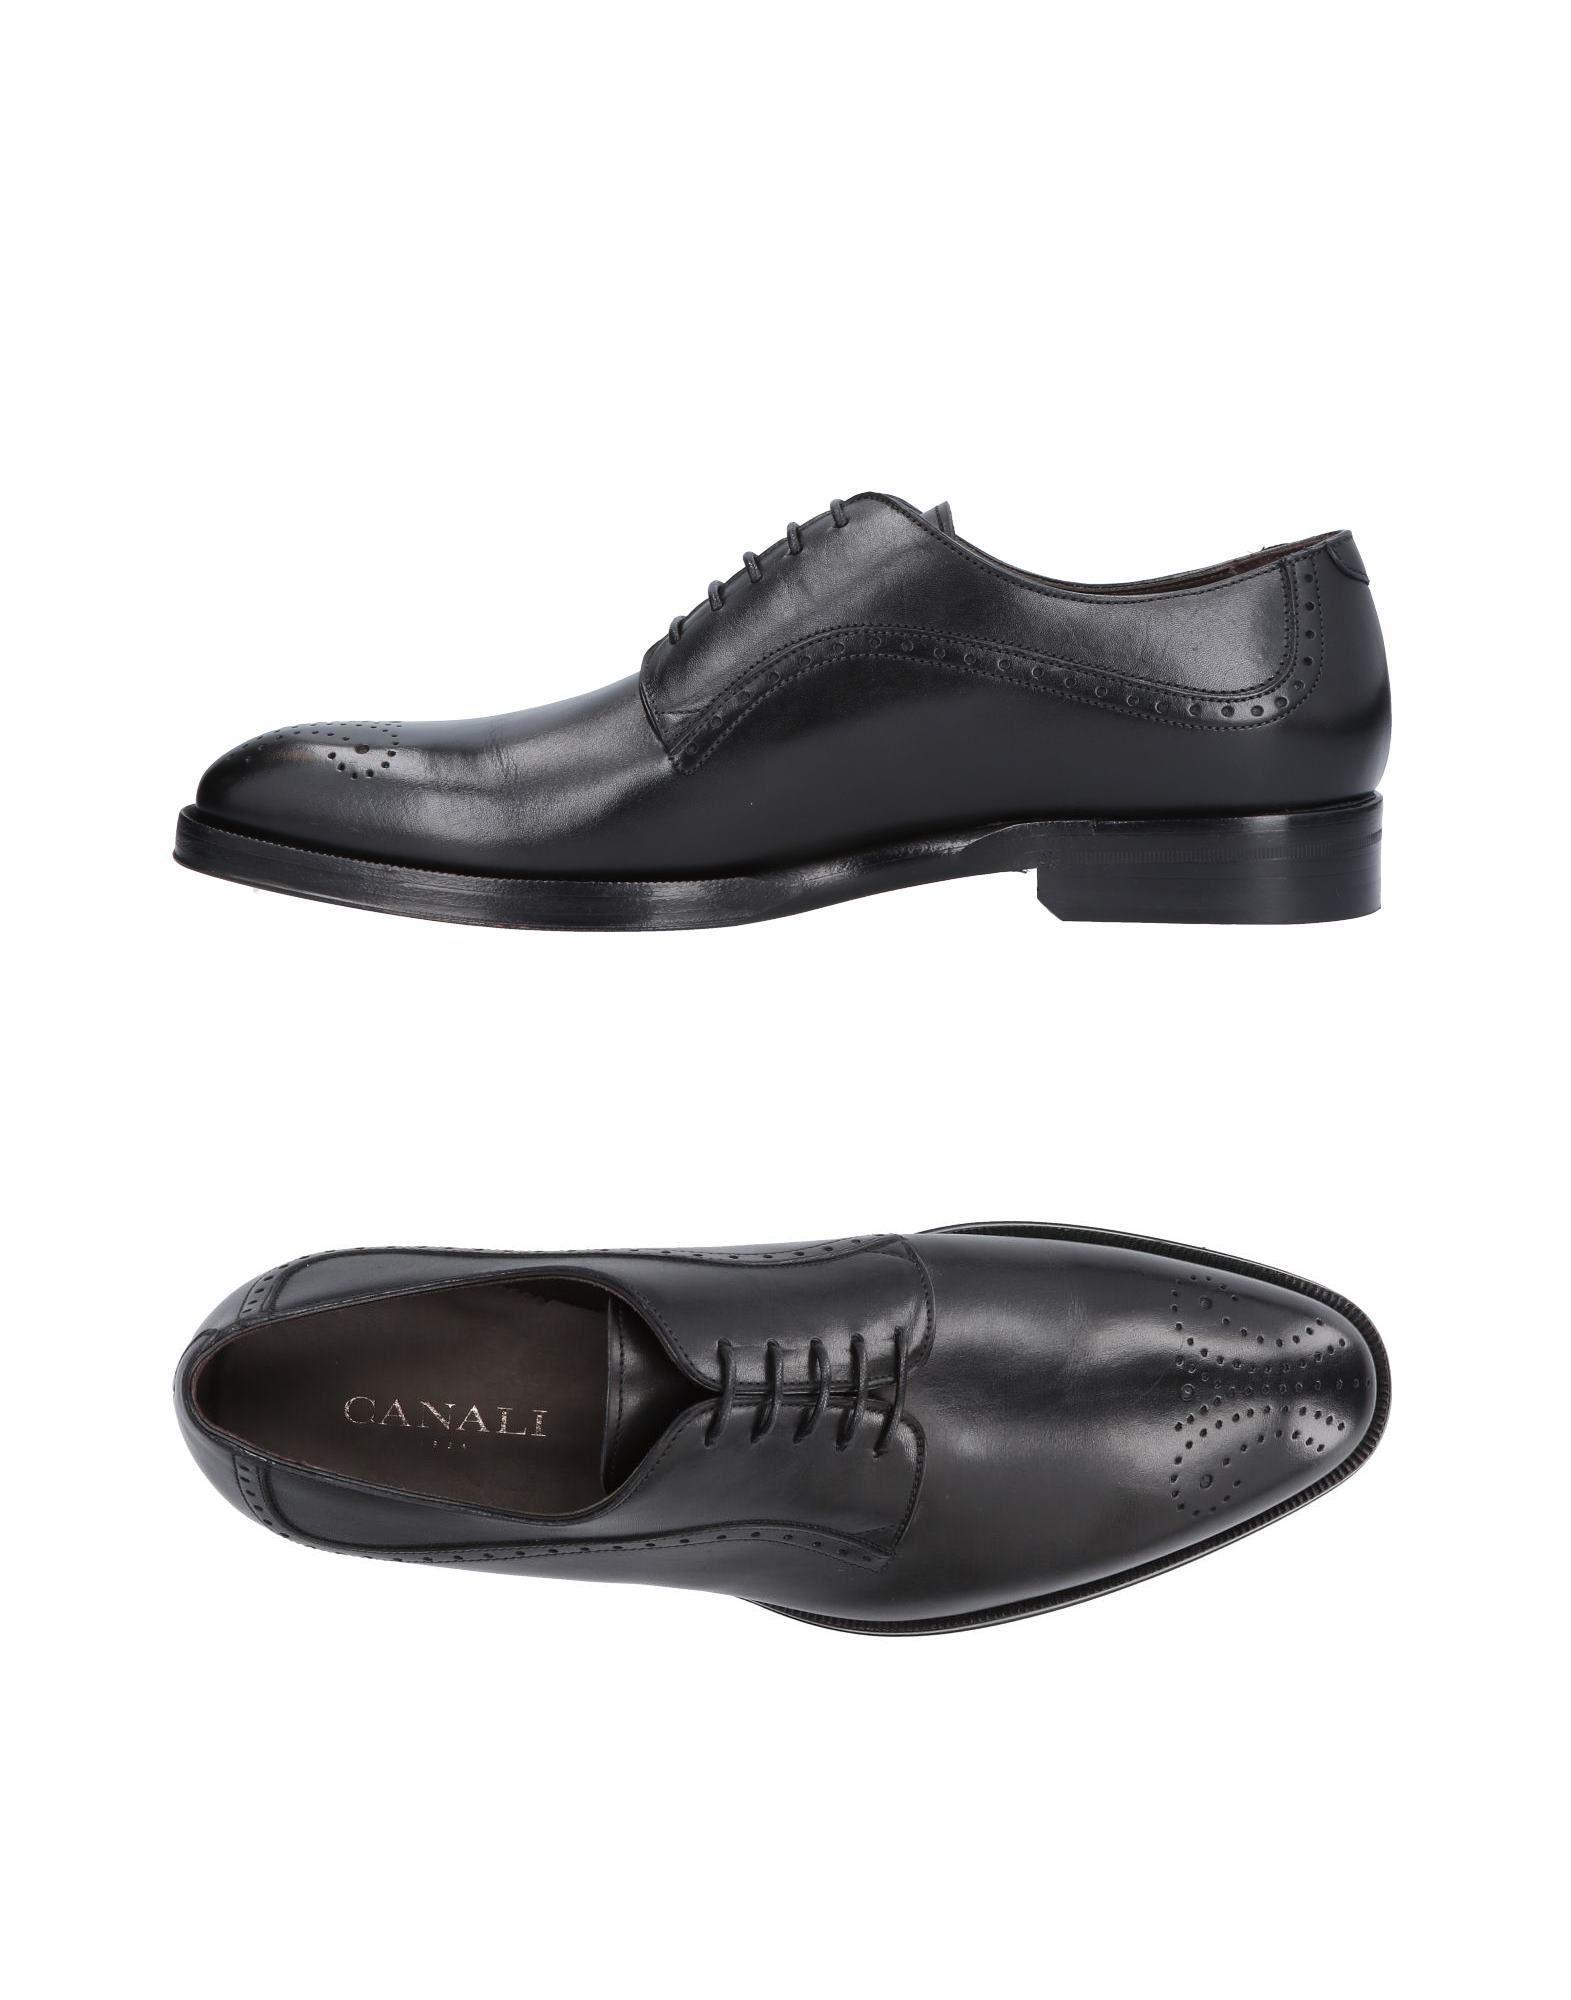 Canali Chaussures À Lacets fPaRk